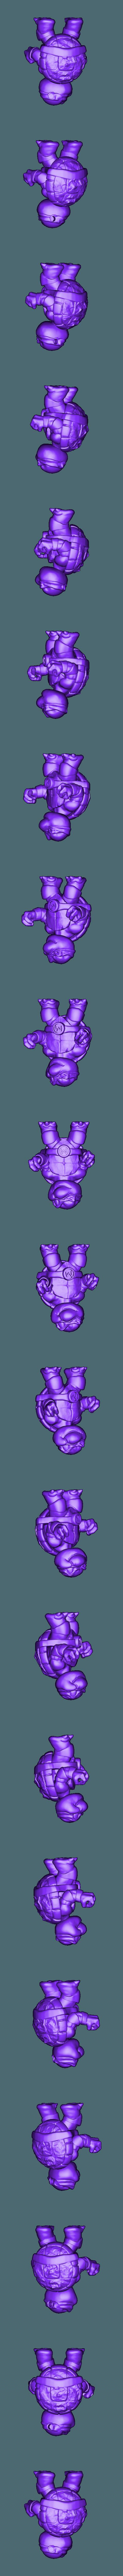 Miky.stl Download STL file Chibi Mutant Ninja turtles Mickey • 3D printable template, Fabiosartbox